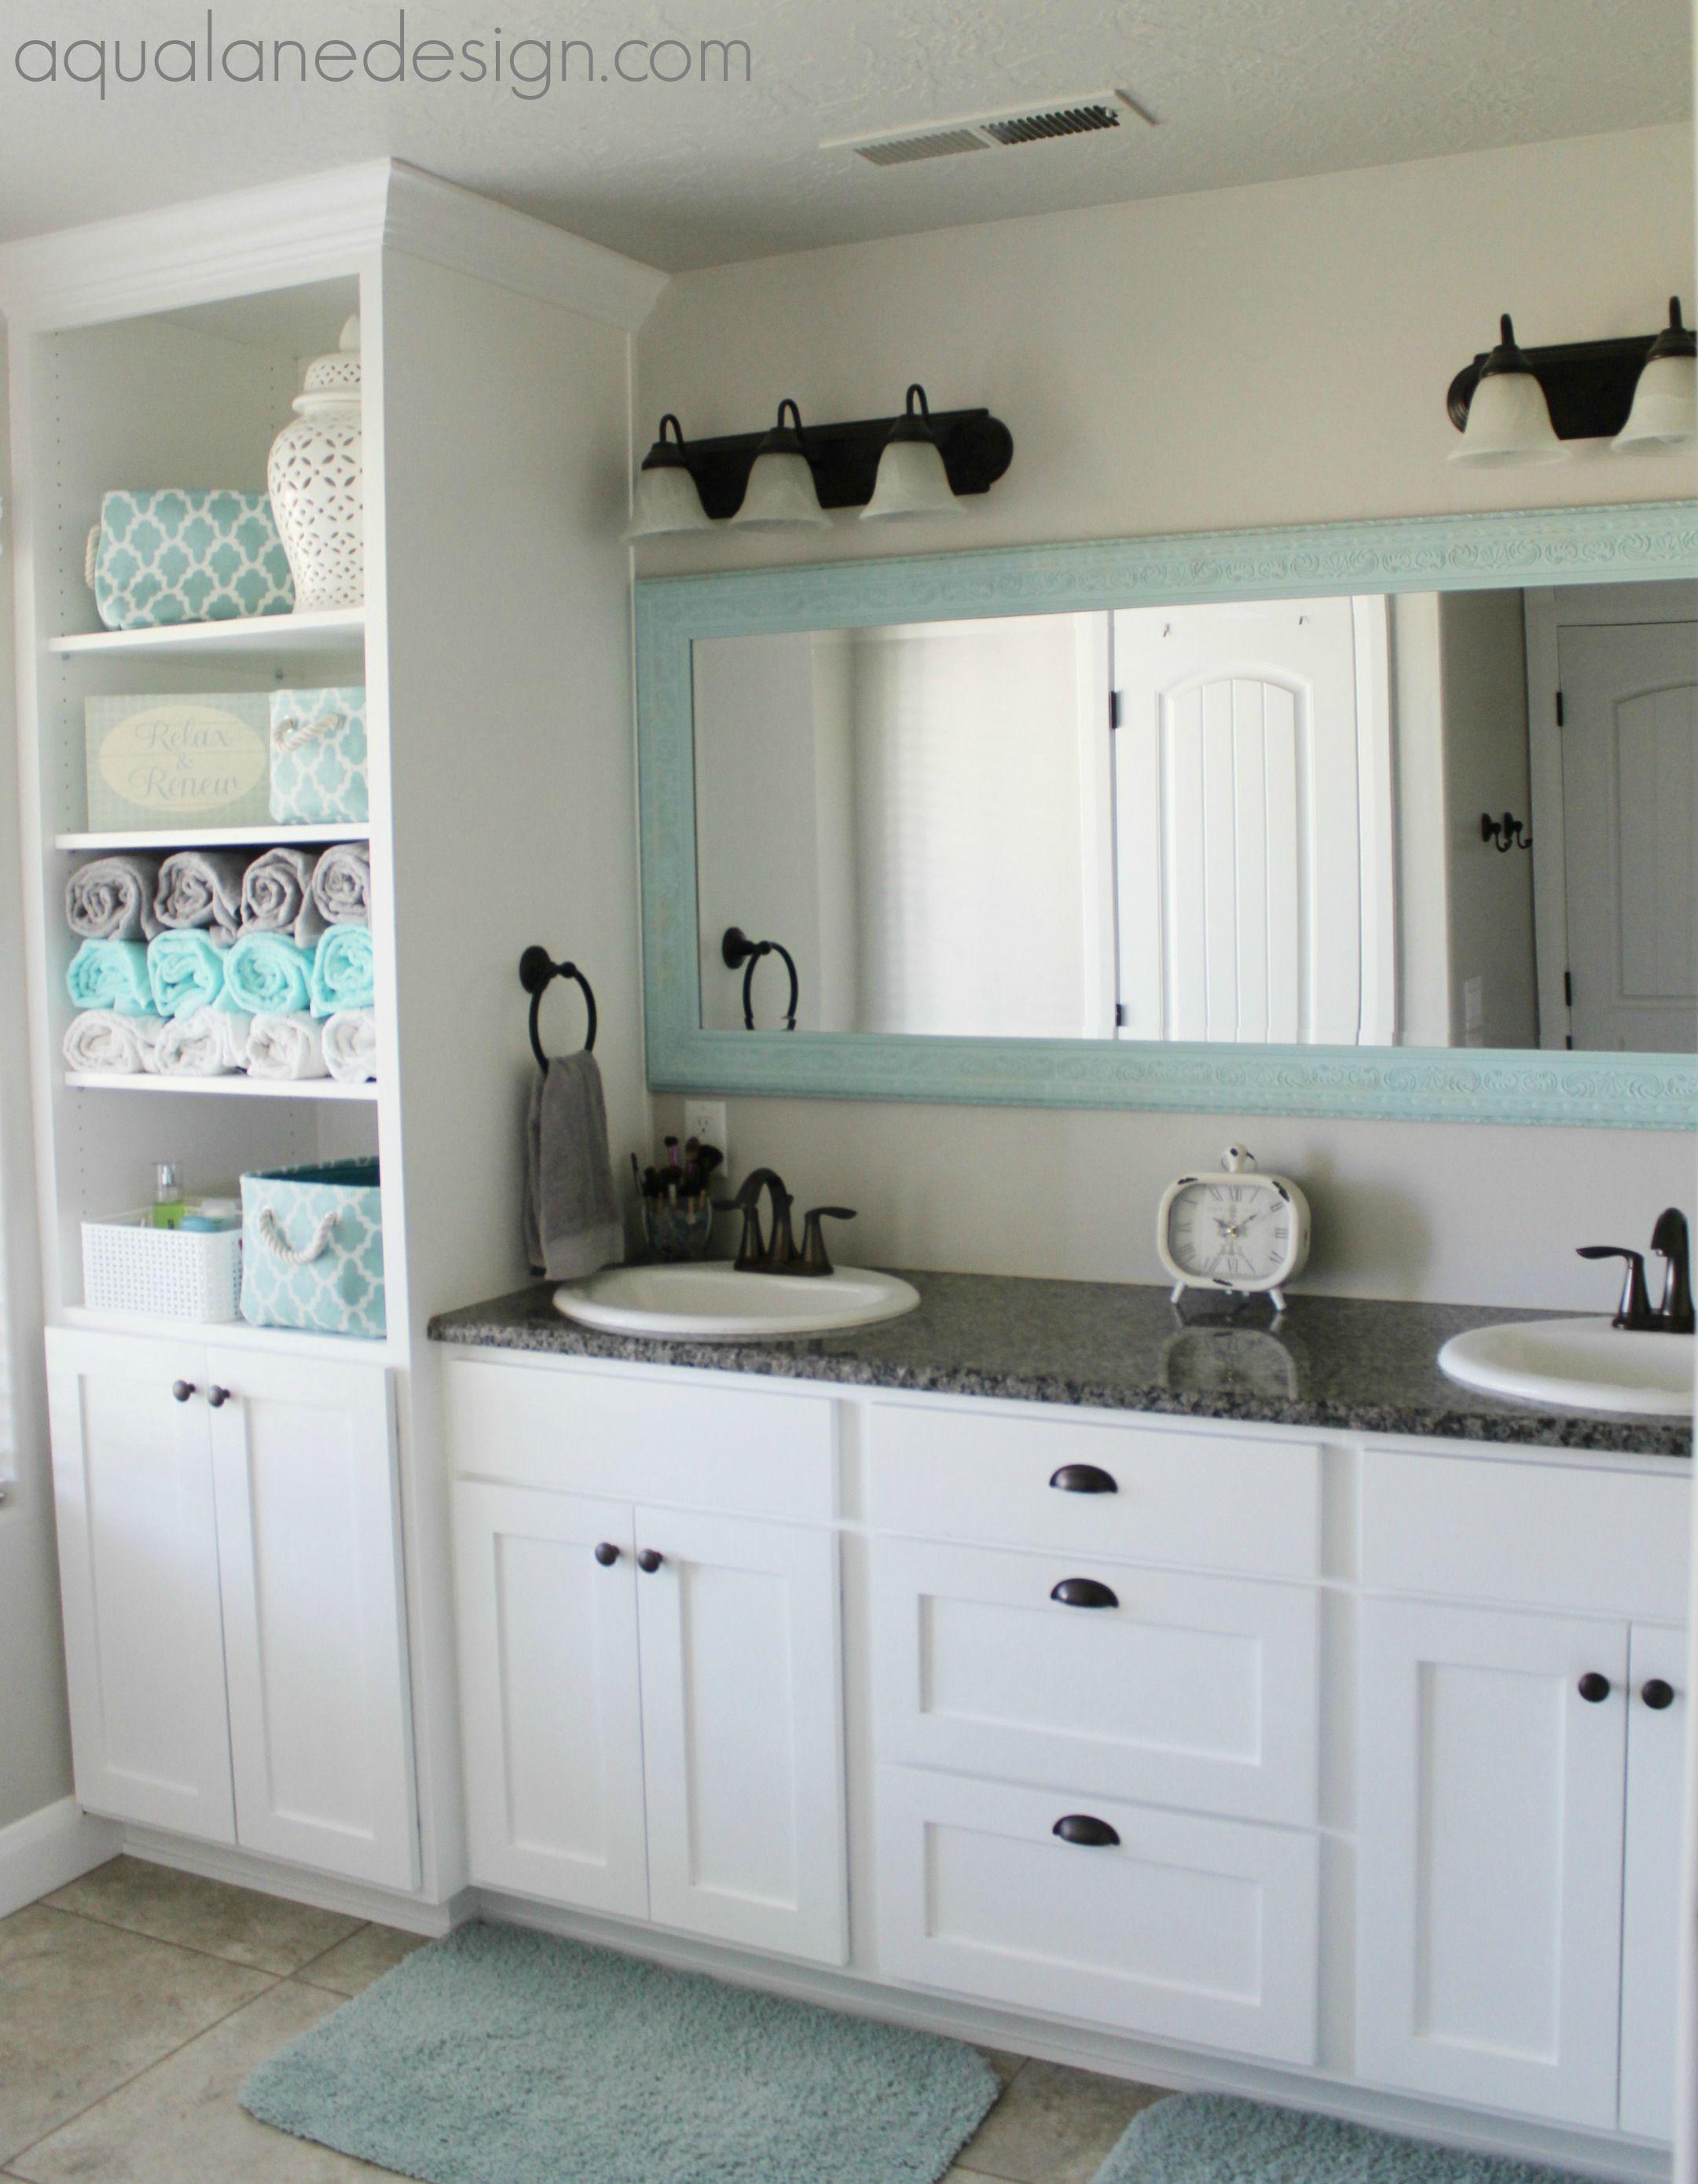 Diy Spa Bathroom On A Budget With Images Master Bathroom